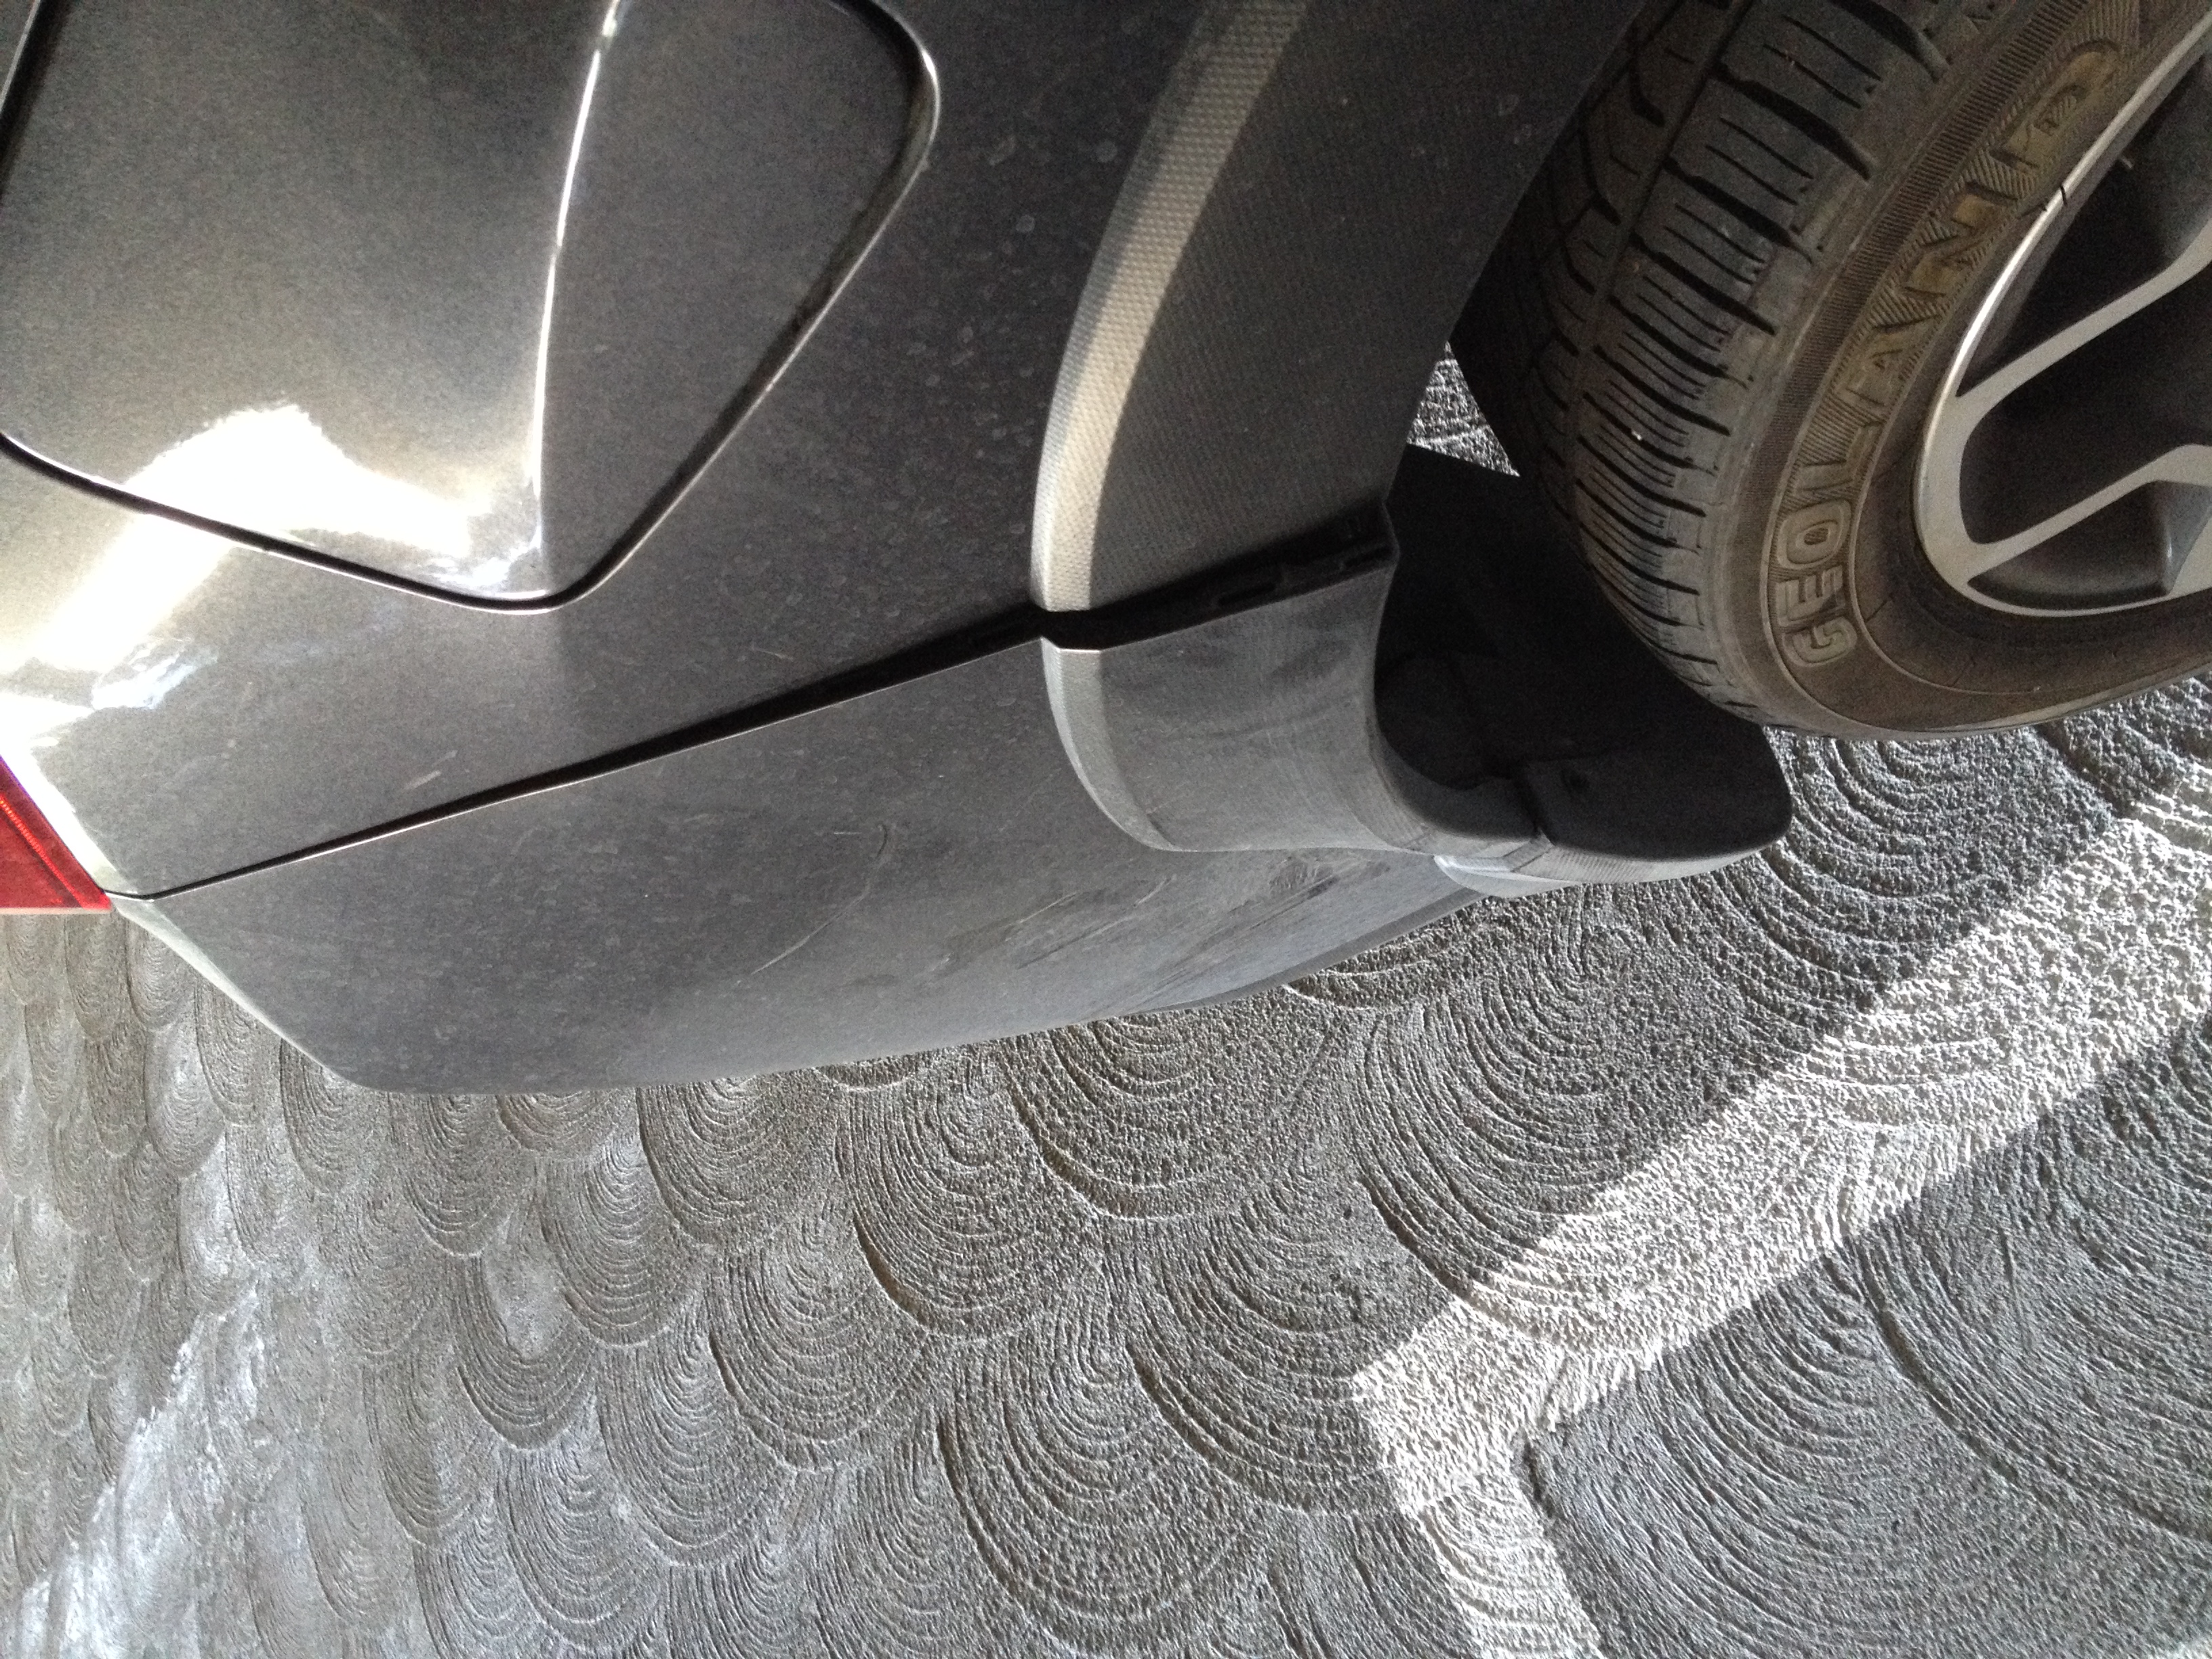 Am I Being Overcharged for Subaru Crosstrek's Rear Bumper